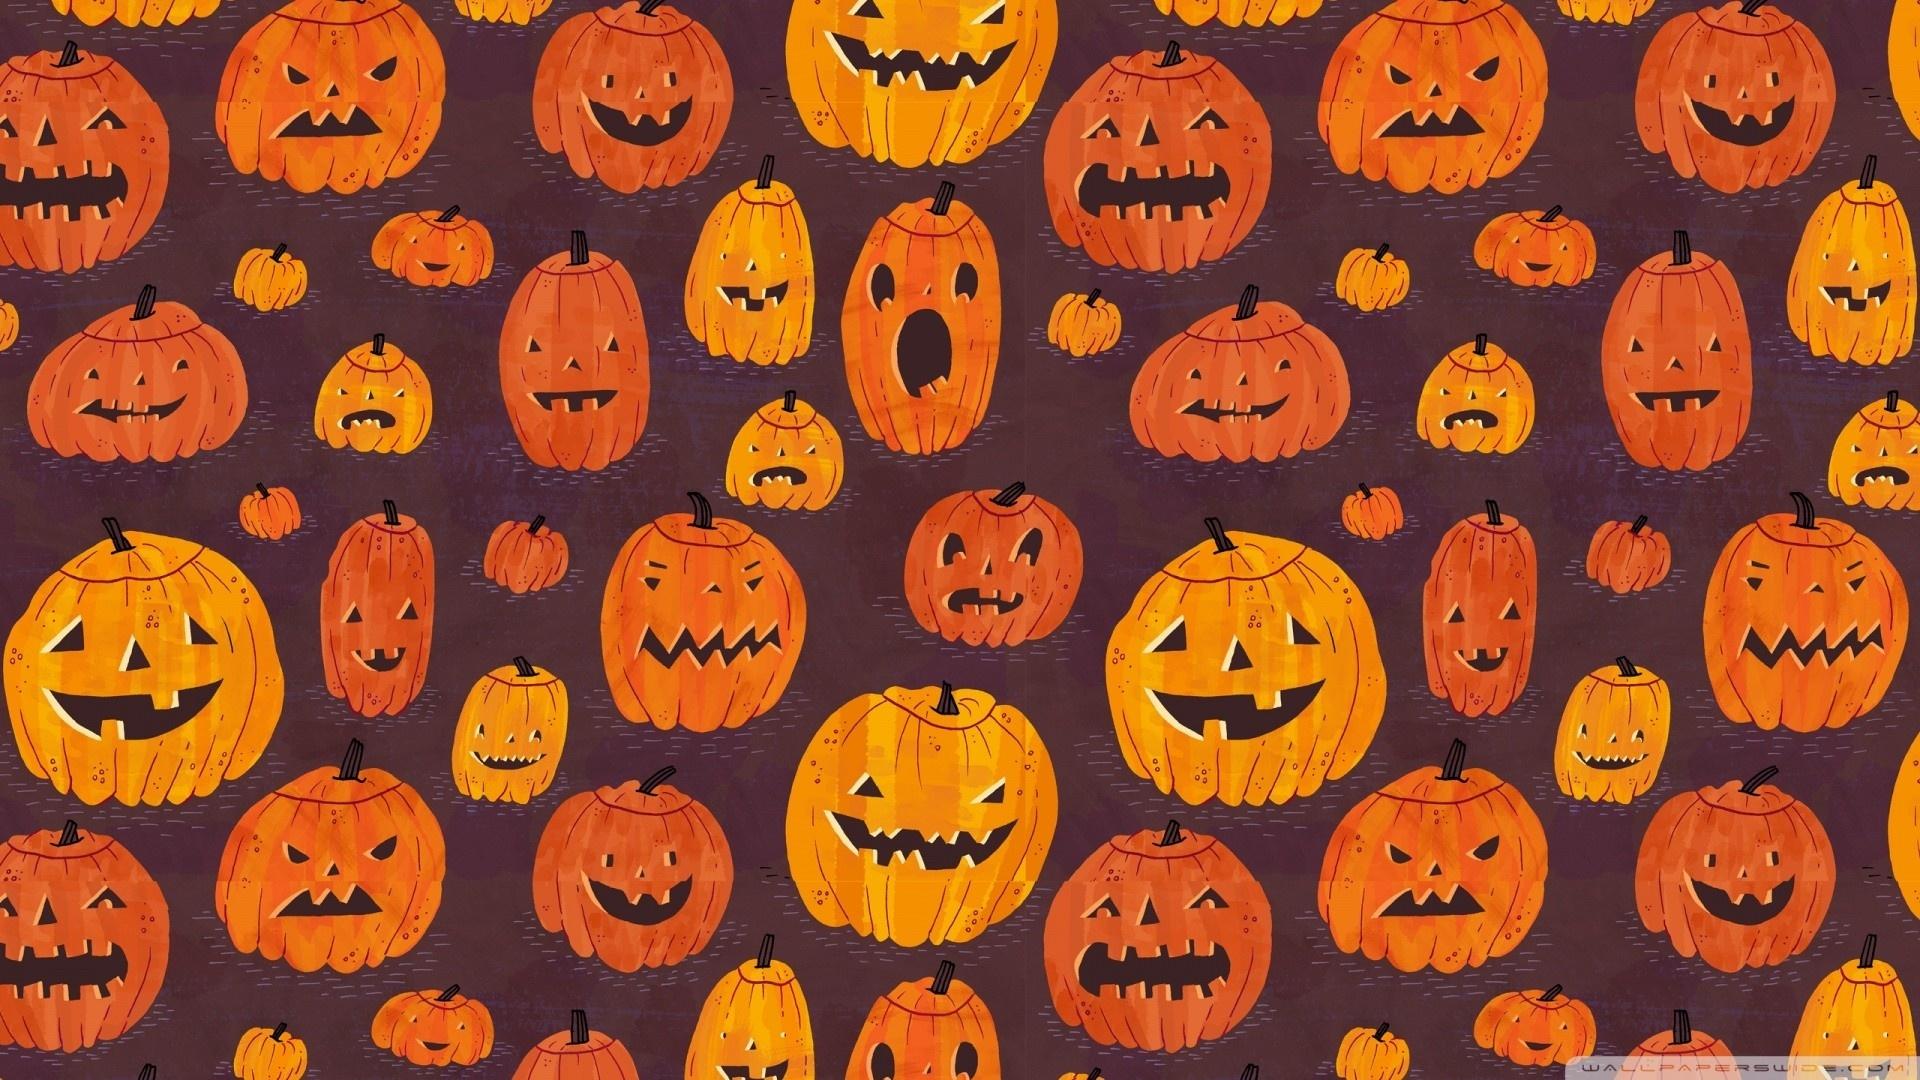 Halloween Pumpkin hd wallpaper download